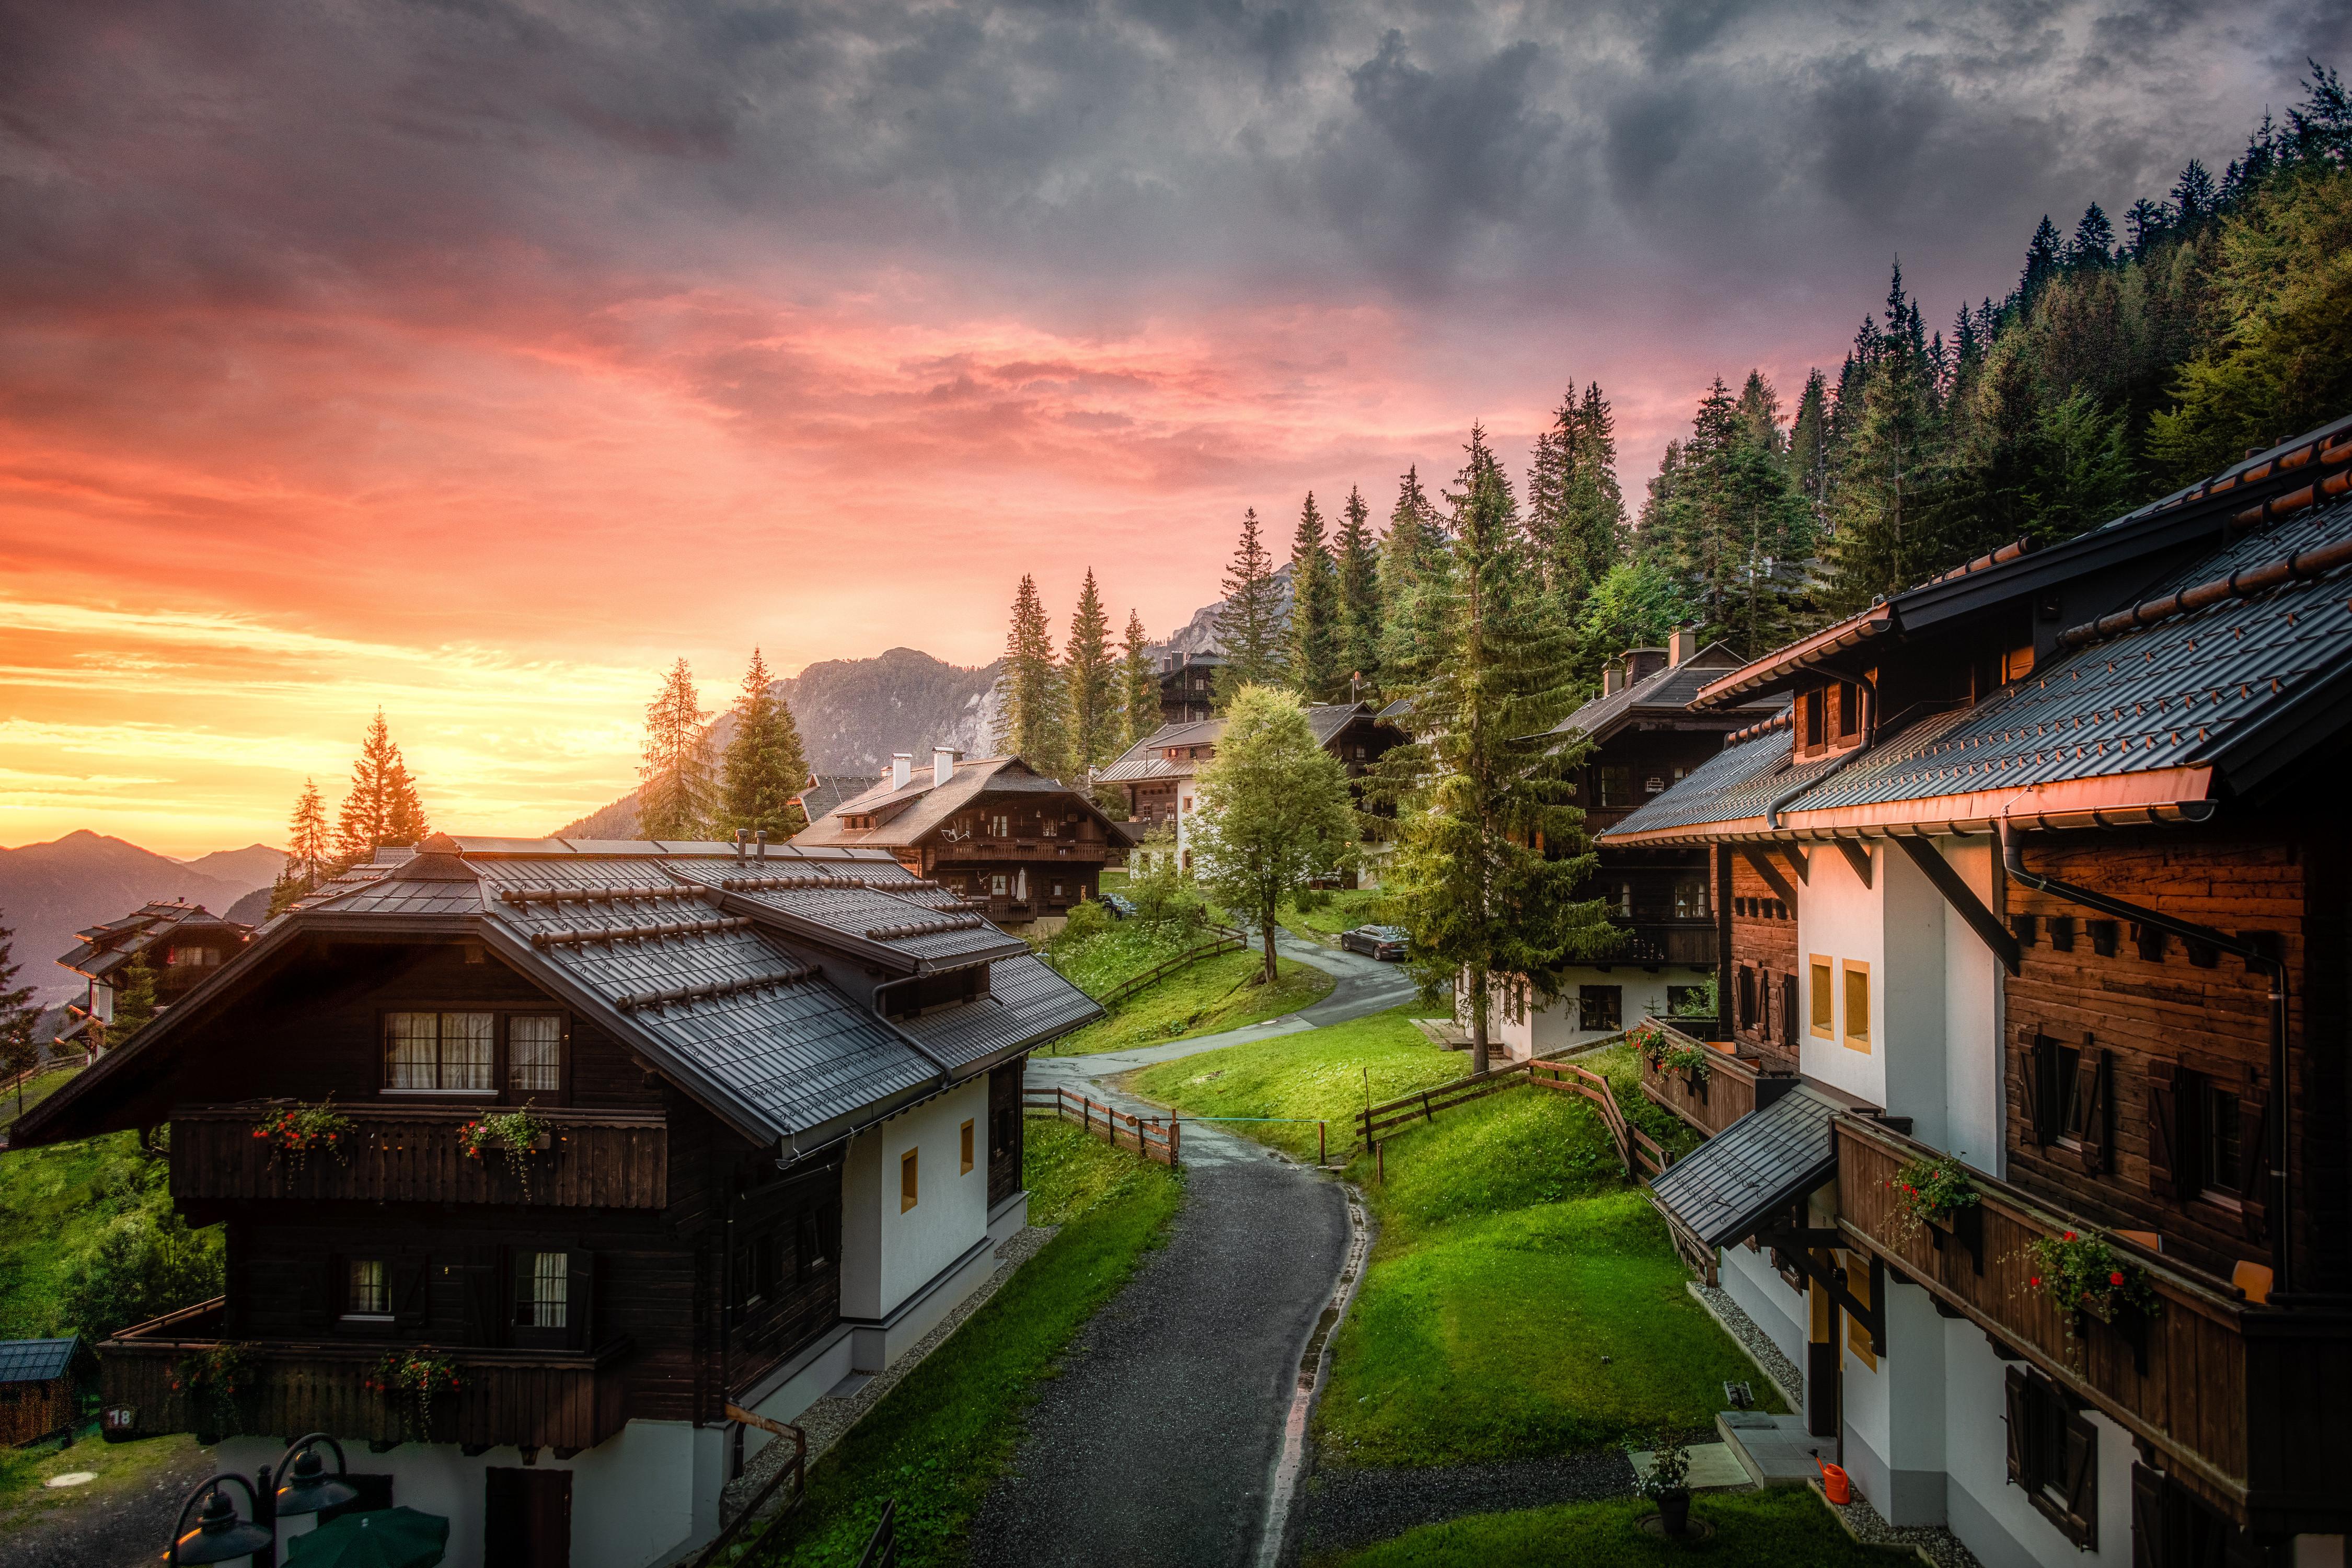 Фотография Австрия Carinthia Горы Природа Утро Дома облачно гора Здания Облака облако